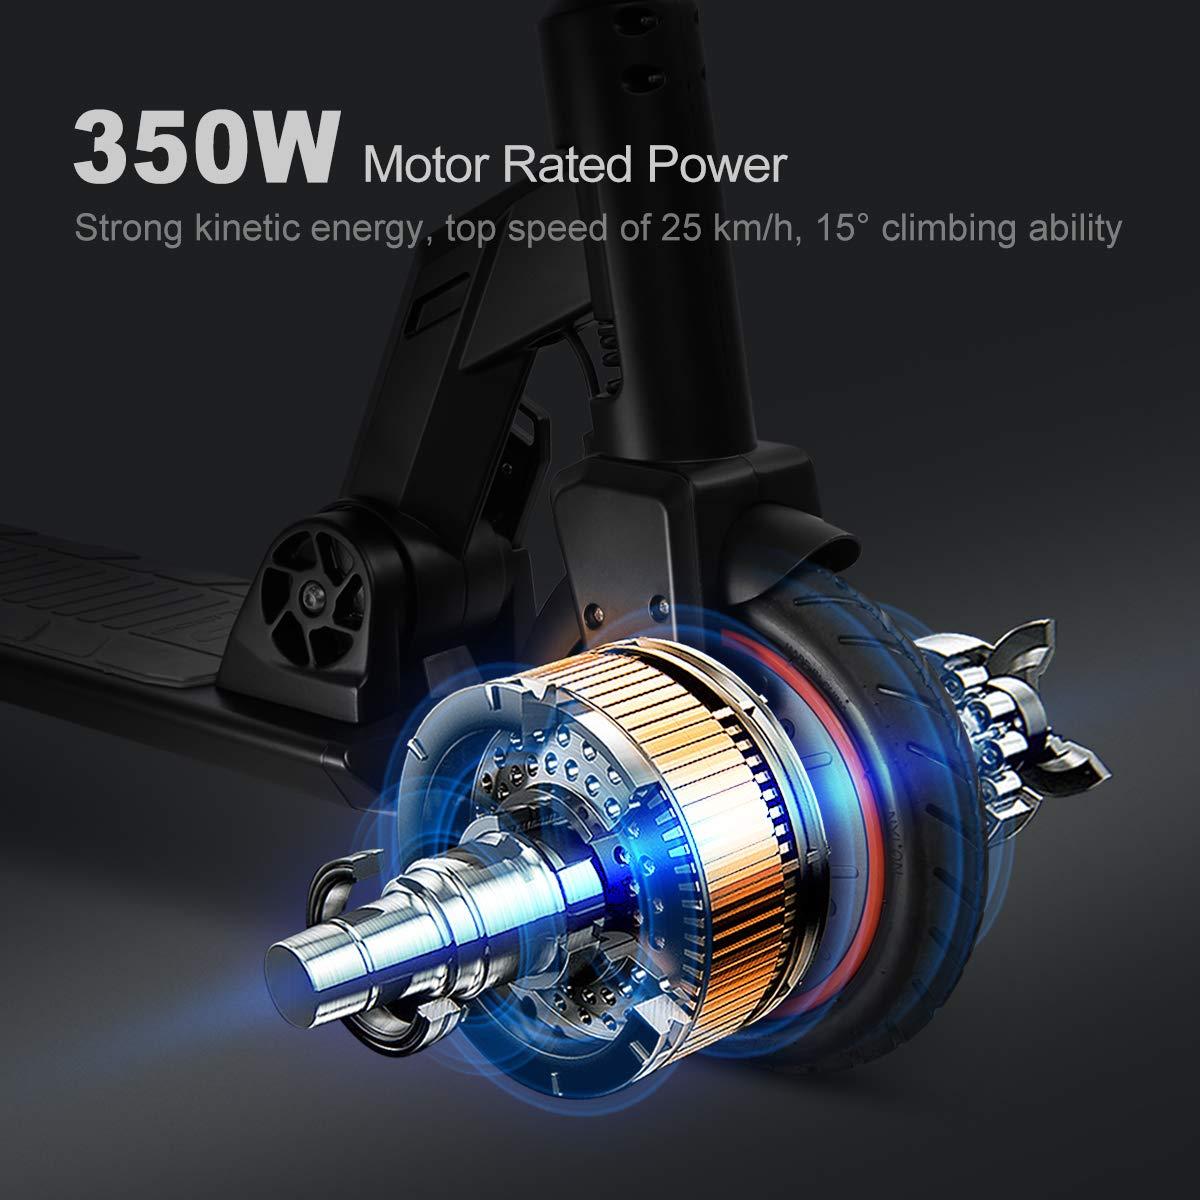 urbetter Kugoo M2 Pro Patinete Electrico Adulto, Patinete Eléctrico Plegable,7.5AH 350W Pantalla LCD 3 Modos de Velocidad 8.5 Pulgadas sólido ...